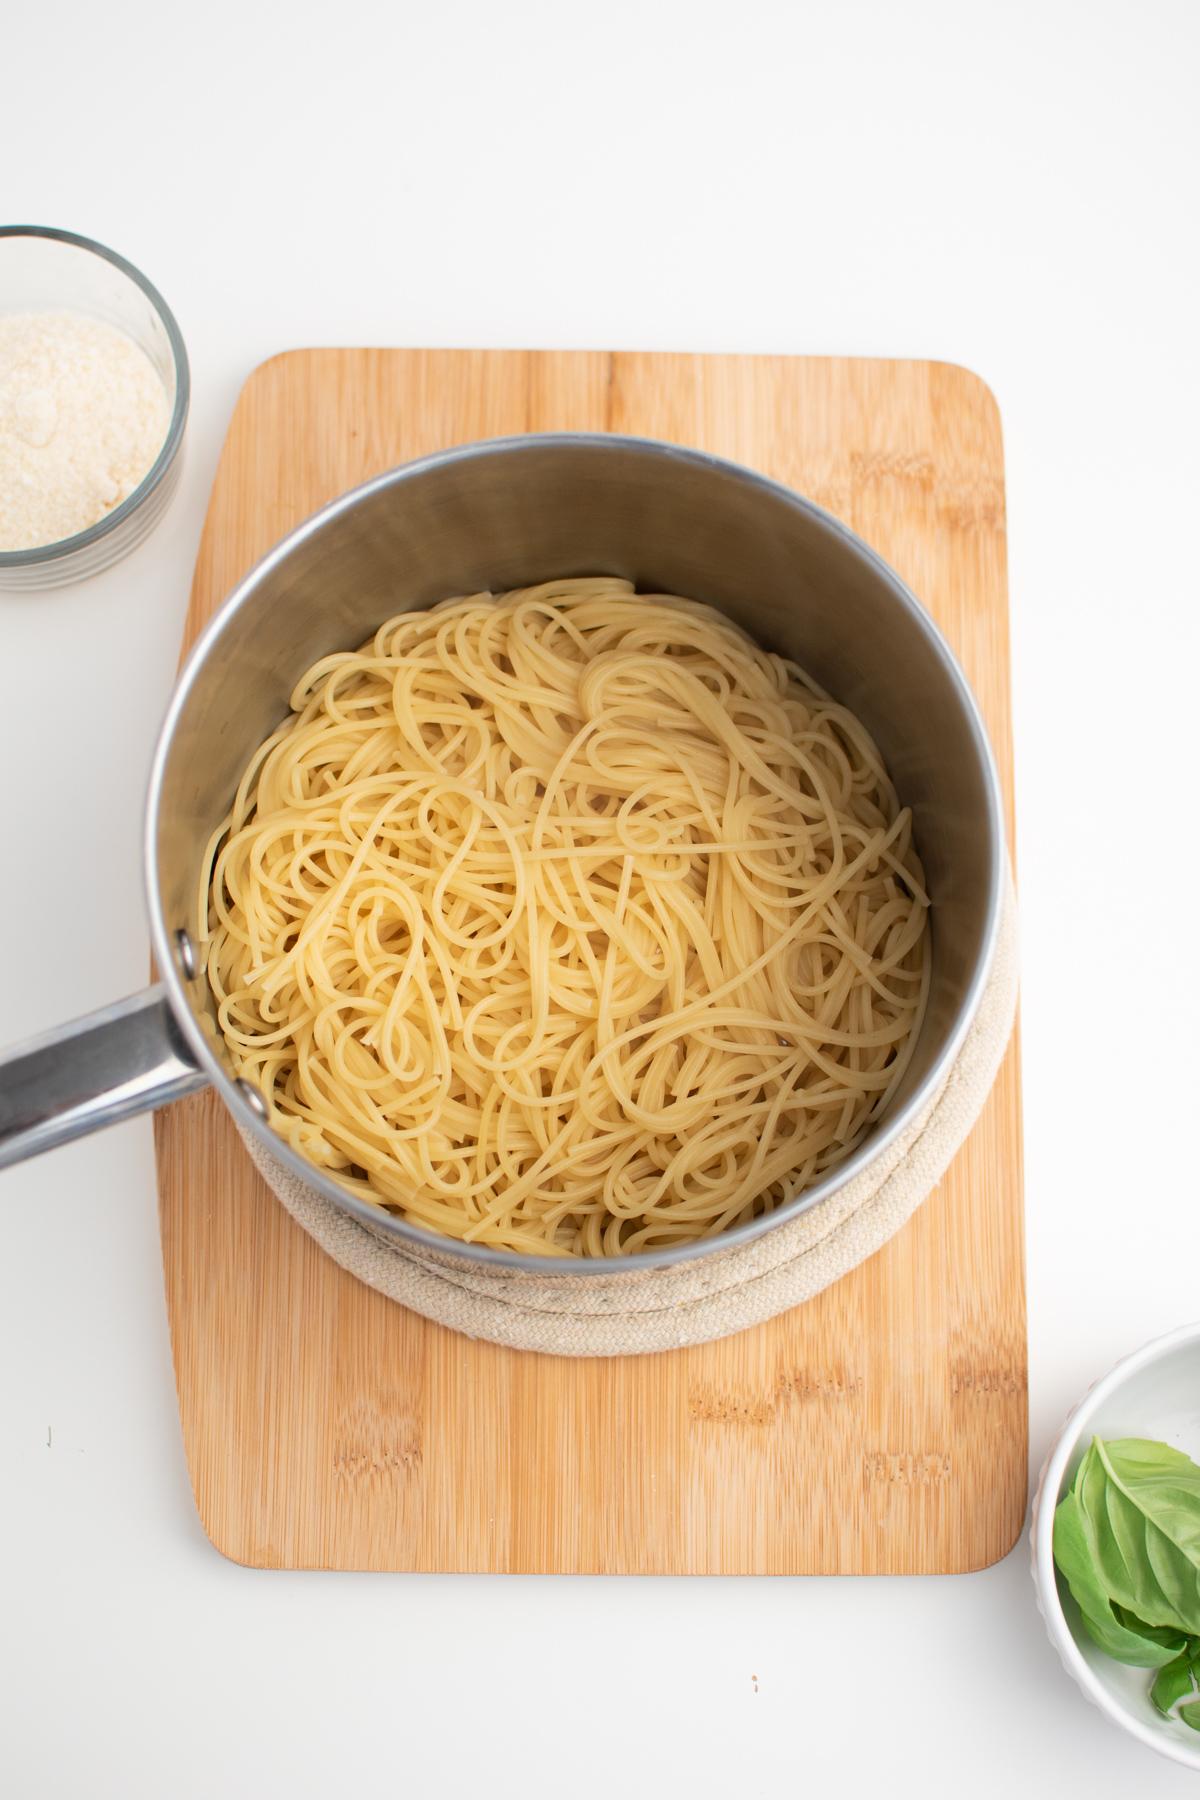 Cooked thin spaghetti in pot on wood cutting board.